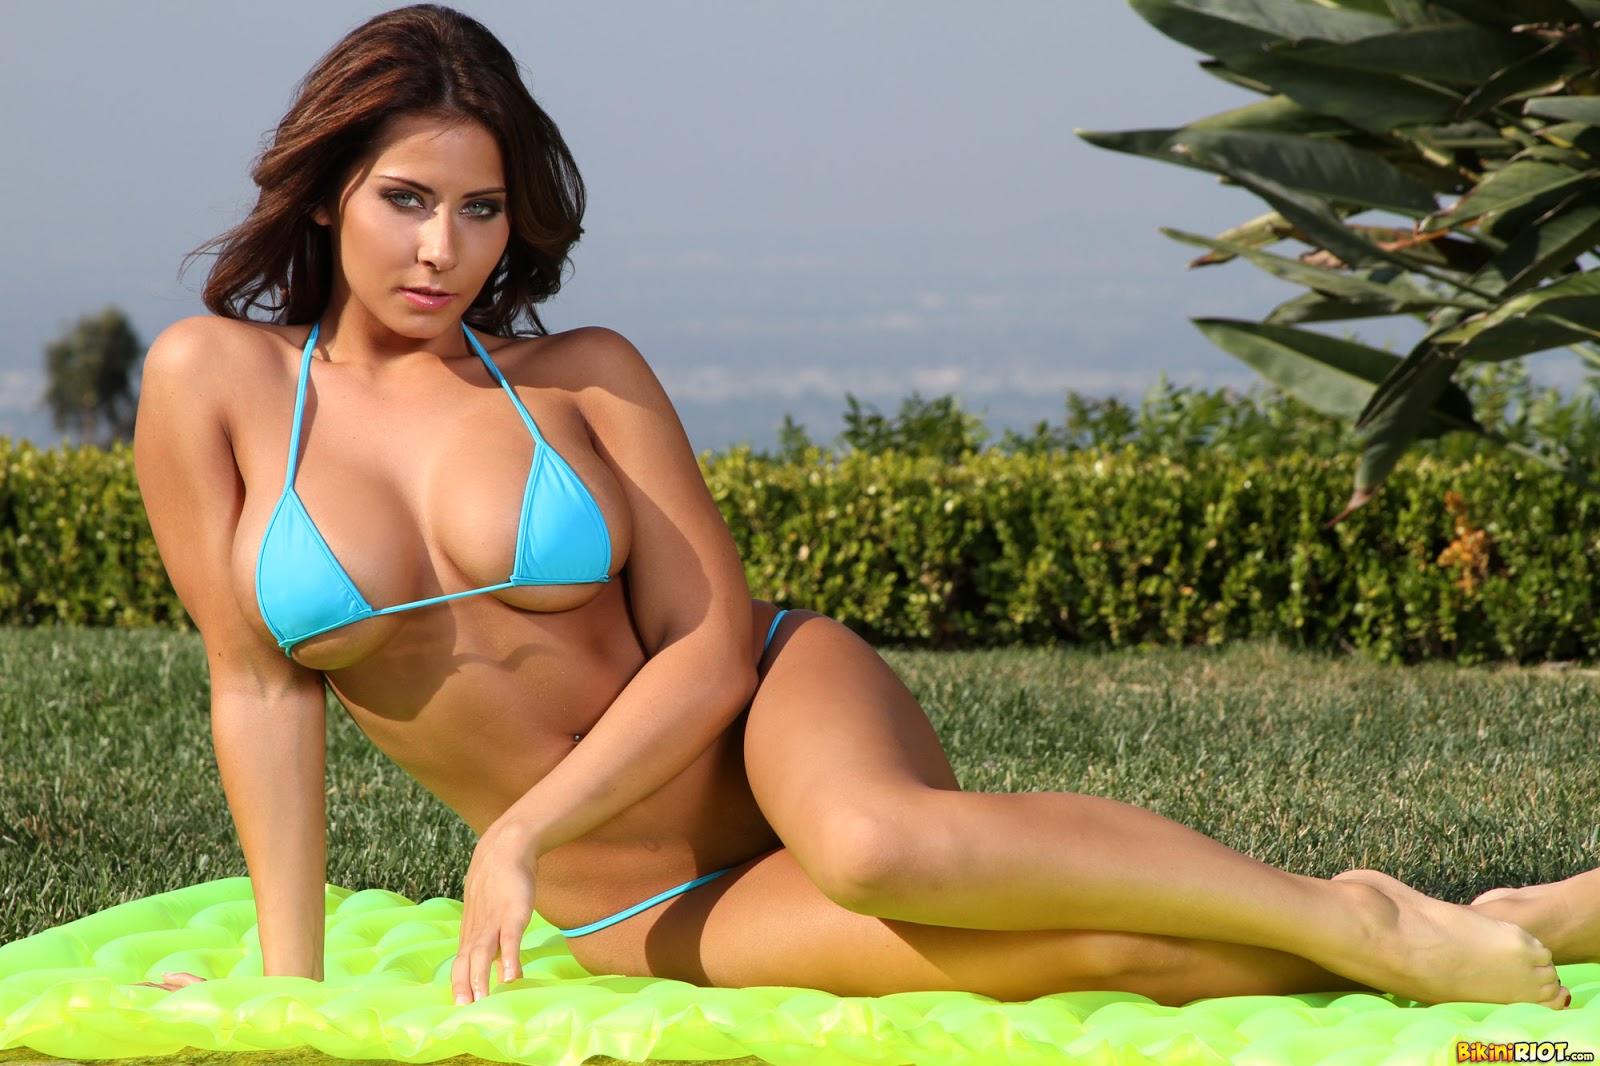 Celebrities Entertainment - Everything About Celebrities: Madison Ivy Sexy New Blue Bikini ...